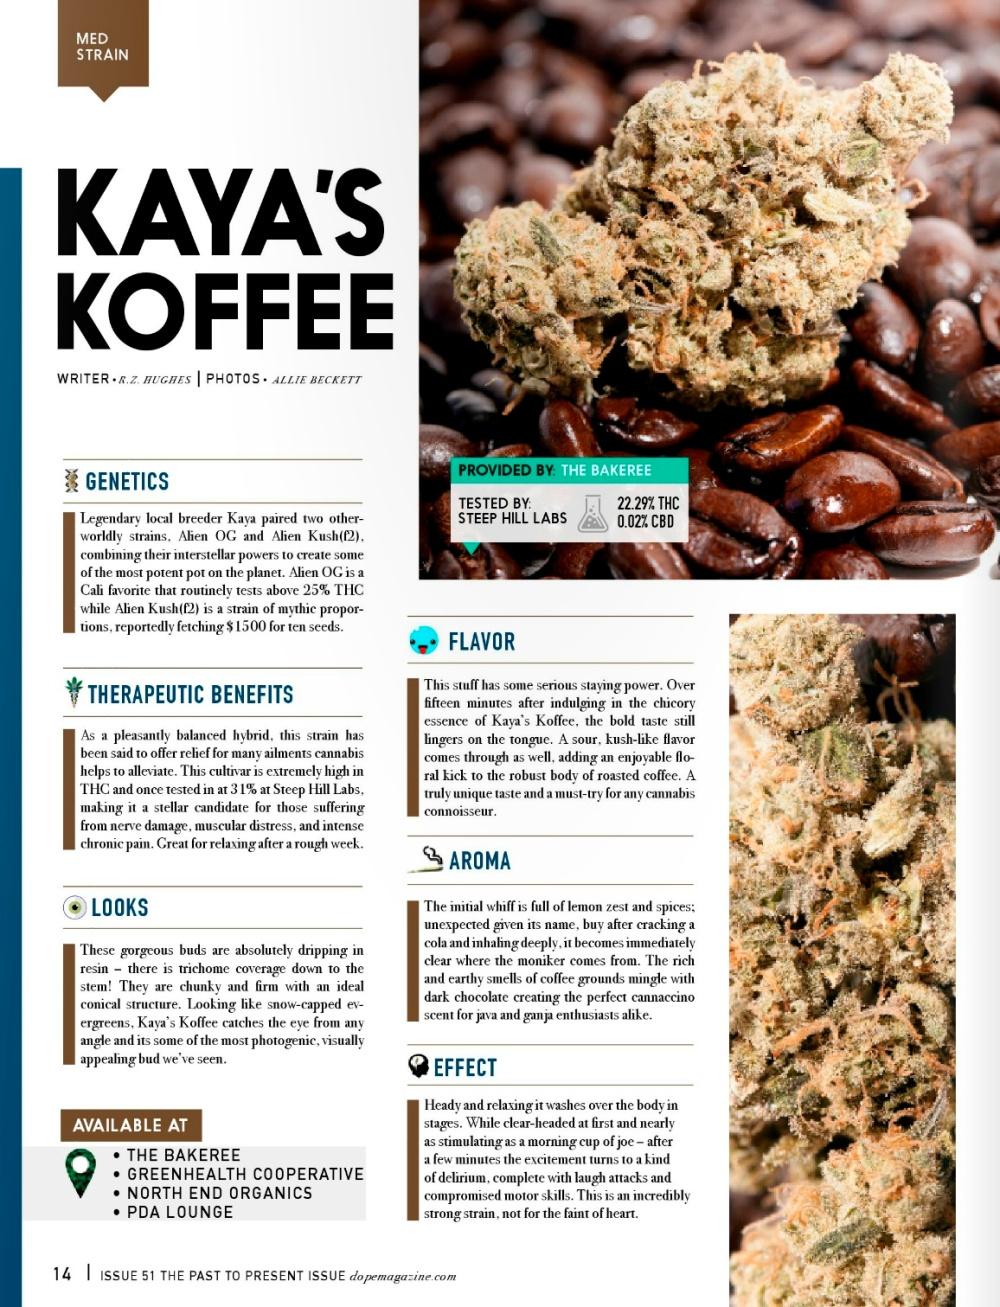 nov15_strain_koffee